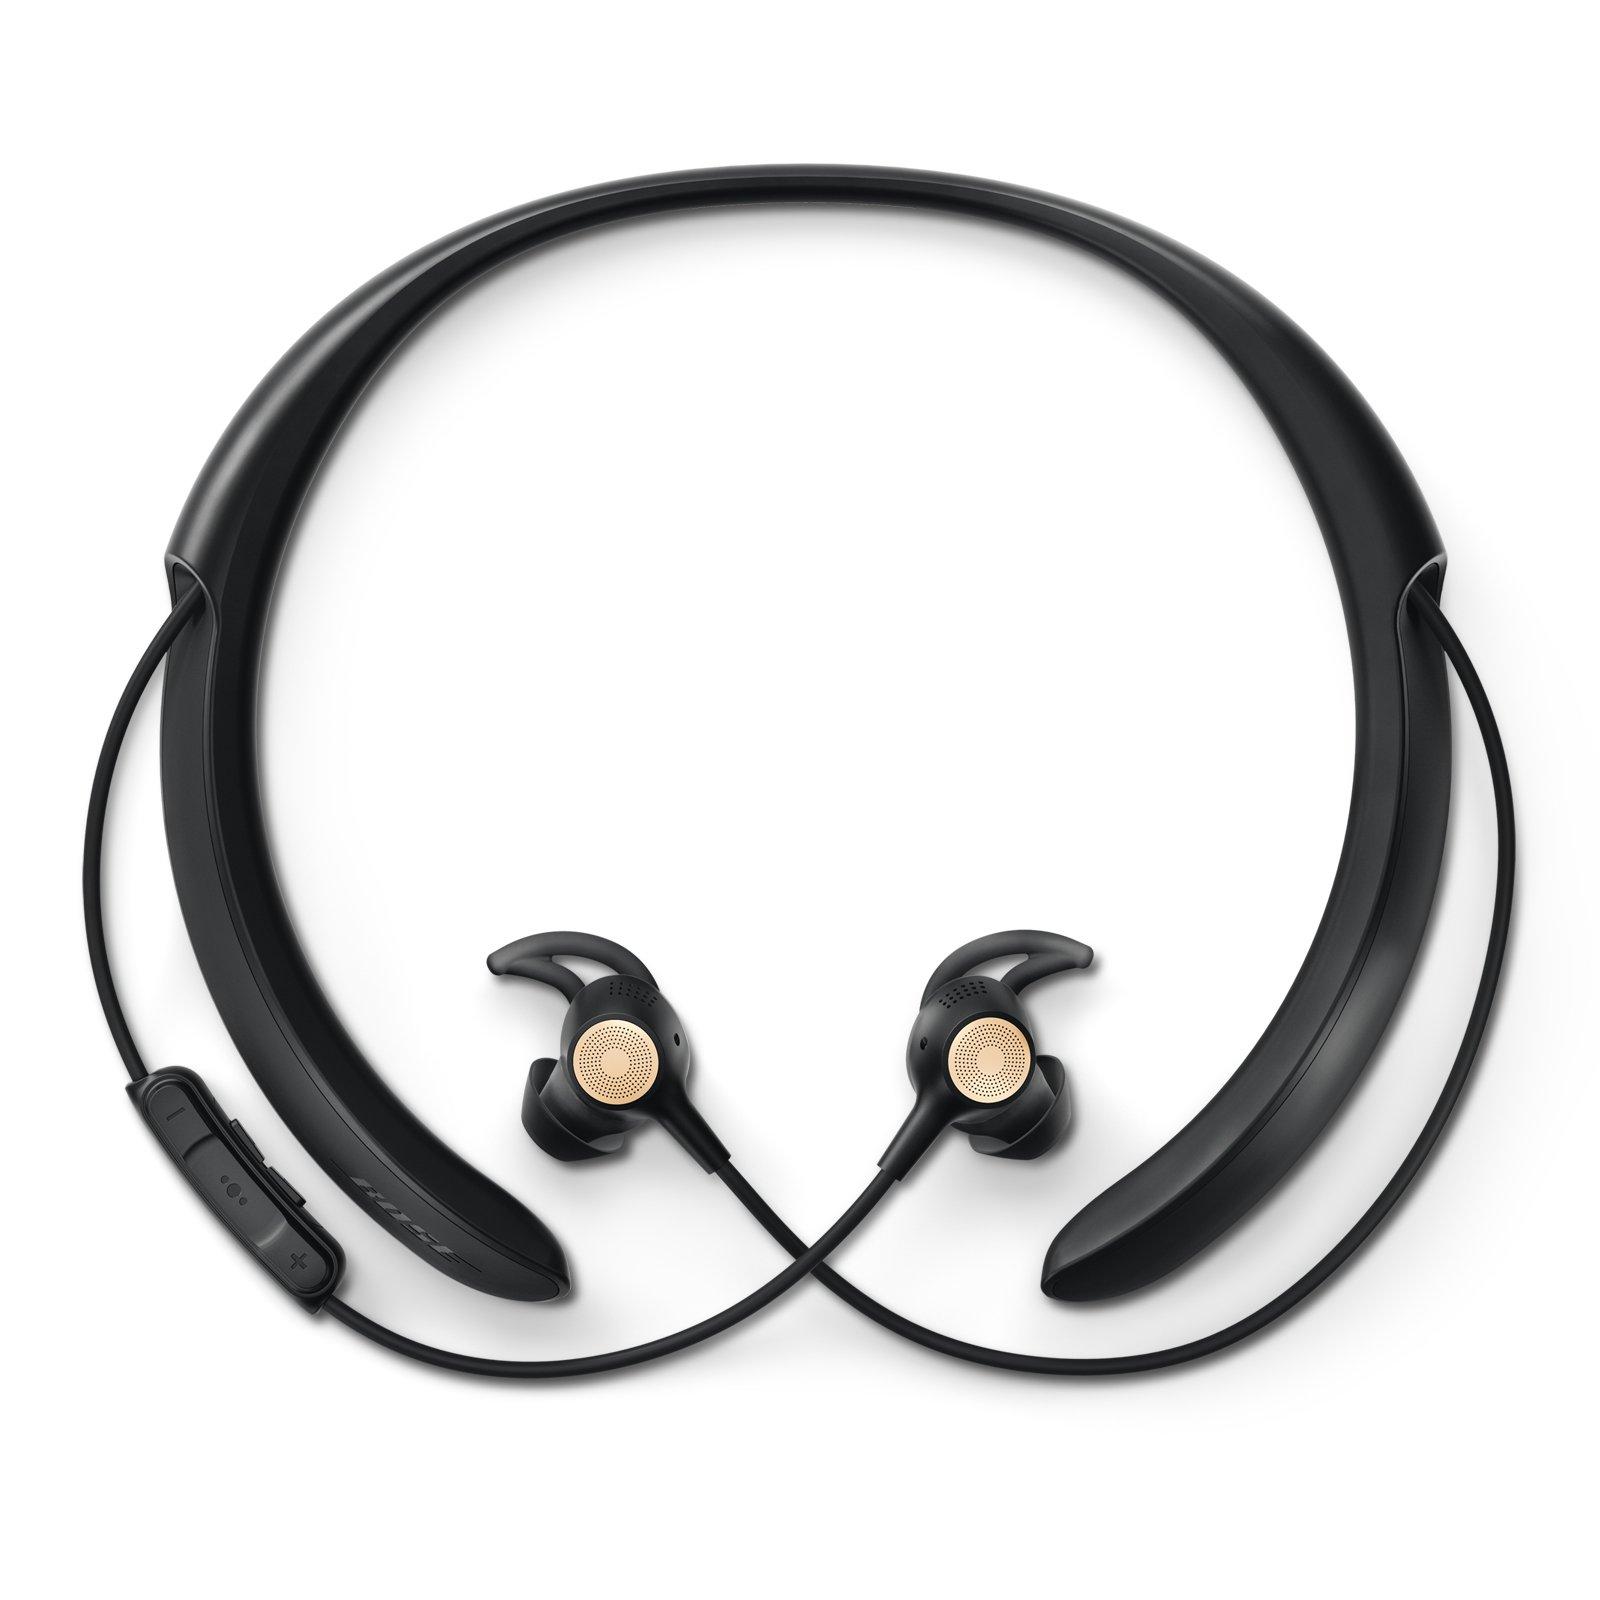 Bose Hearphones: Conversation-Enhancing & Bluetooth Noise Cancelling Headphones by Bose